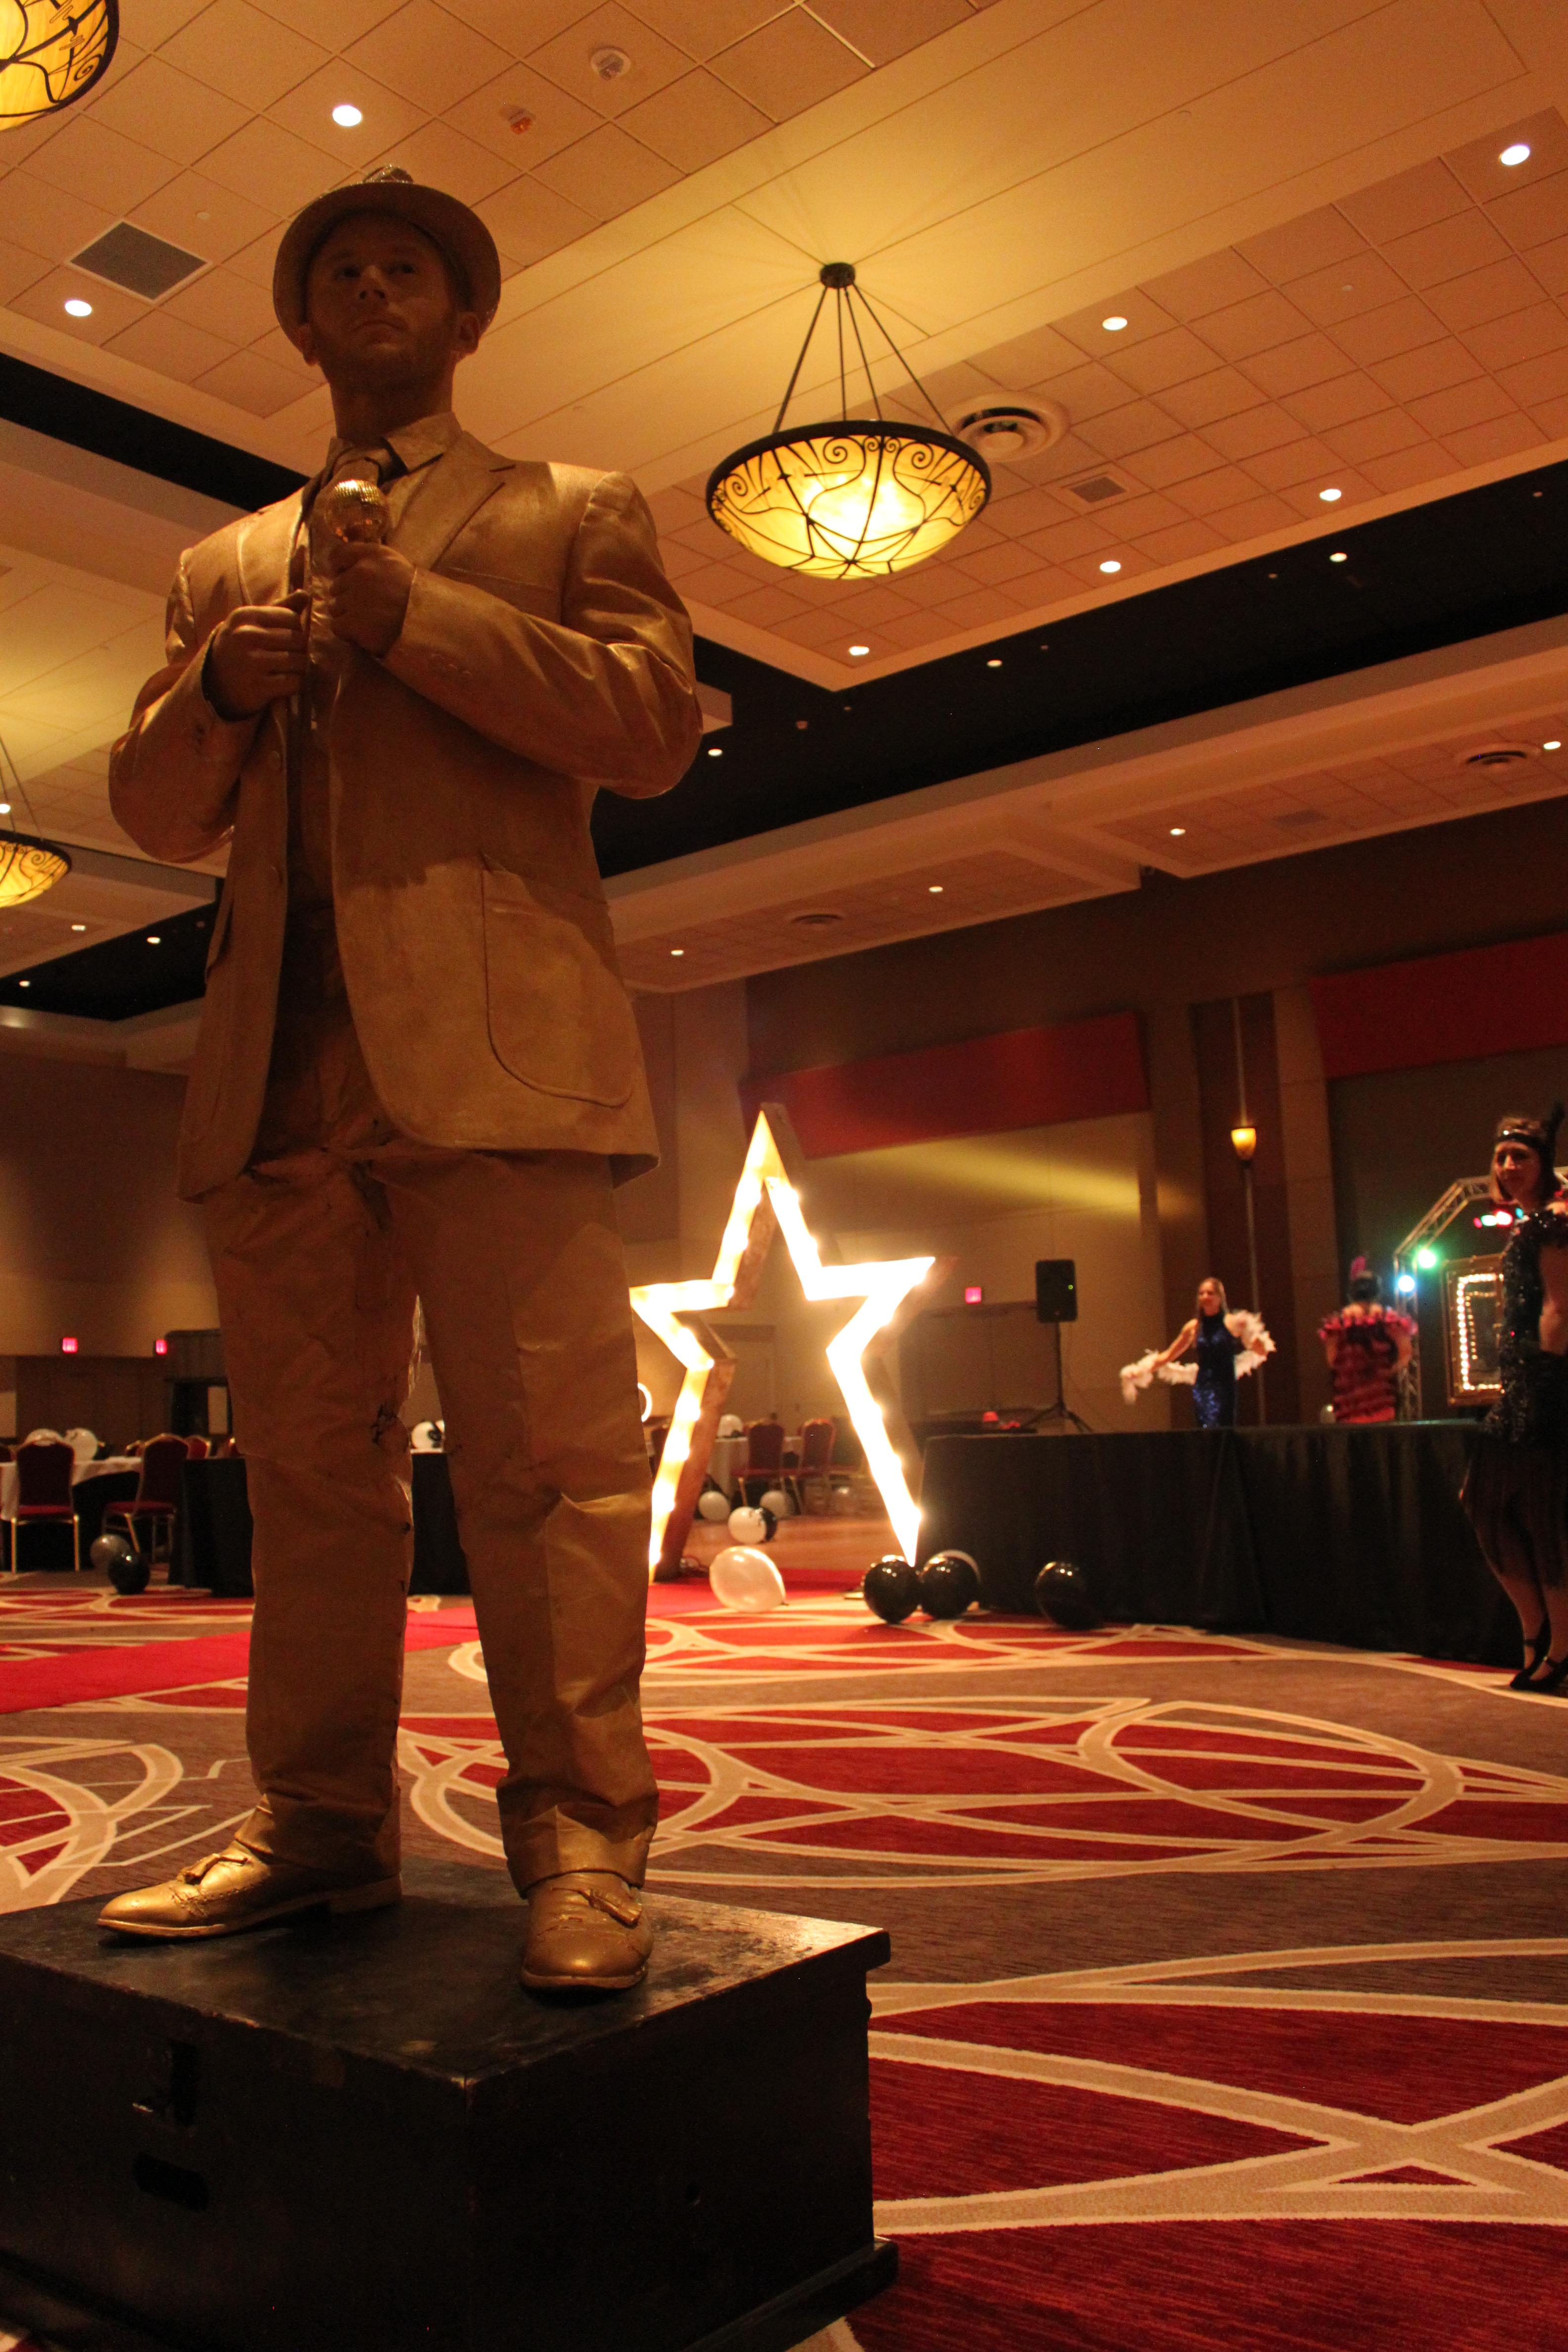 Gold Frank Sinatra Statue